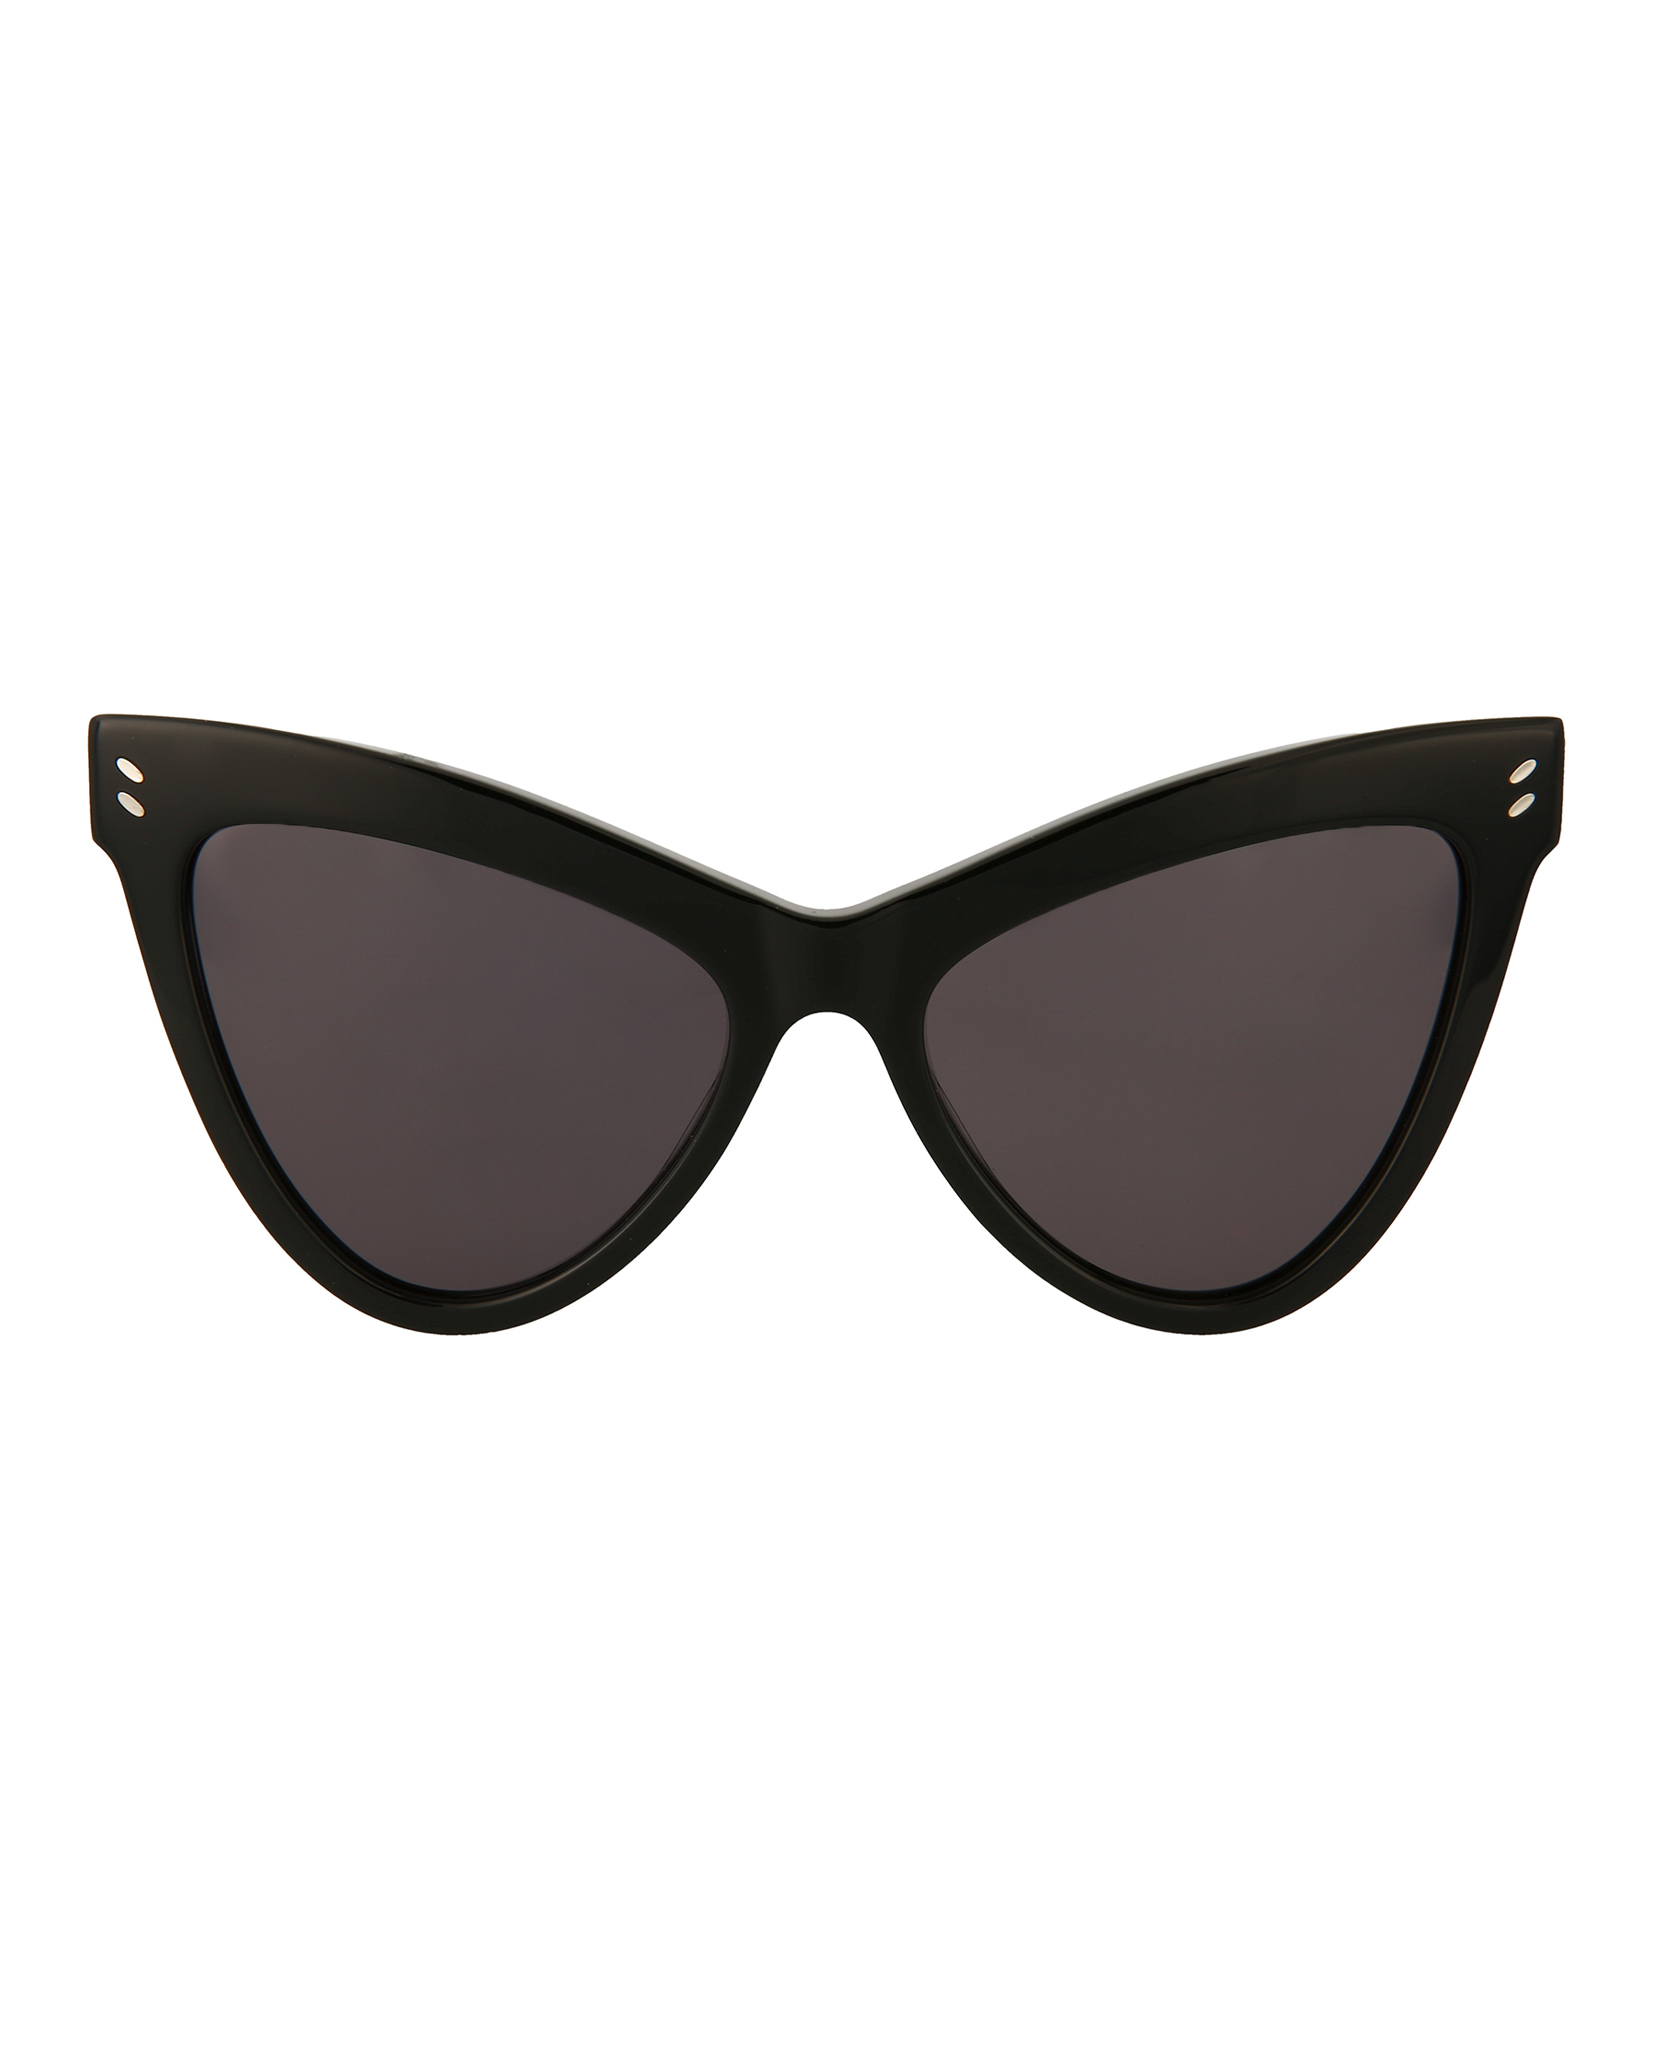 Cat Womens Eye About 30000585 001 Stella Sunglasses Details Mccartney Sc0034s Nnwm8v0